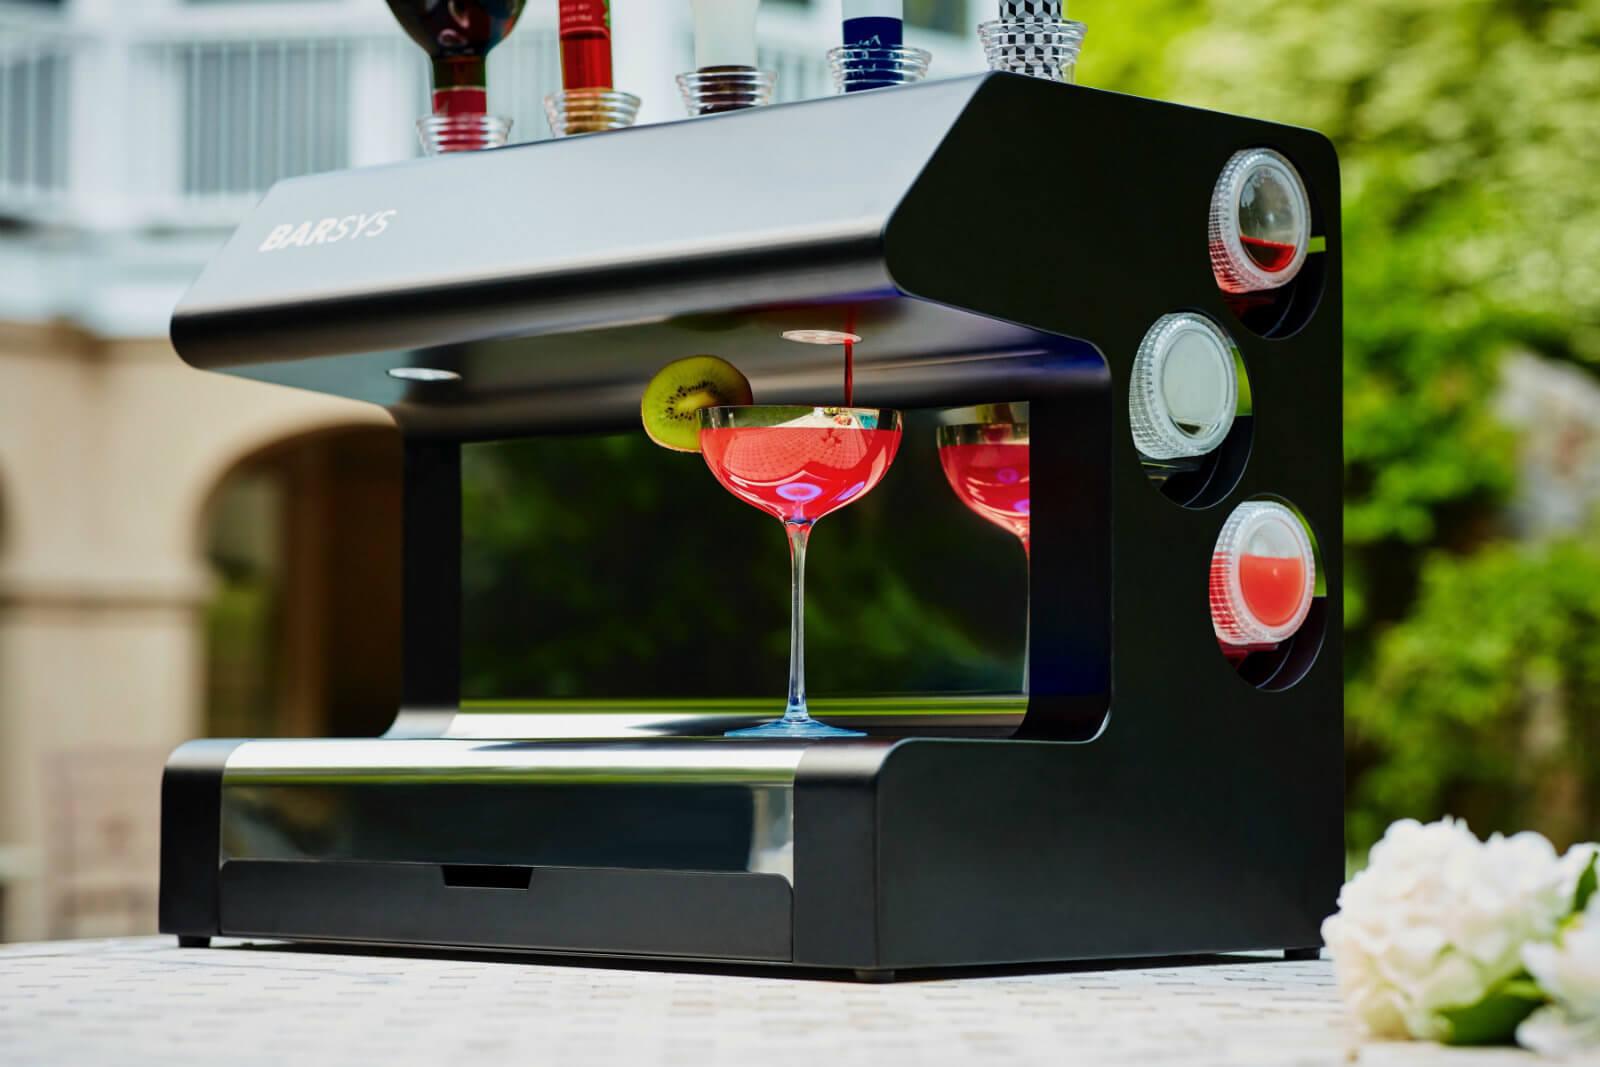 barsys-cocktail-machine